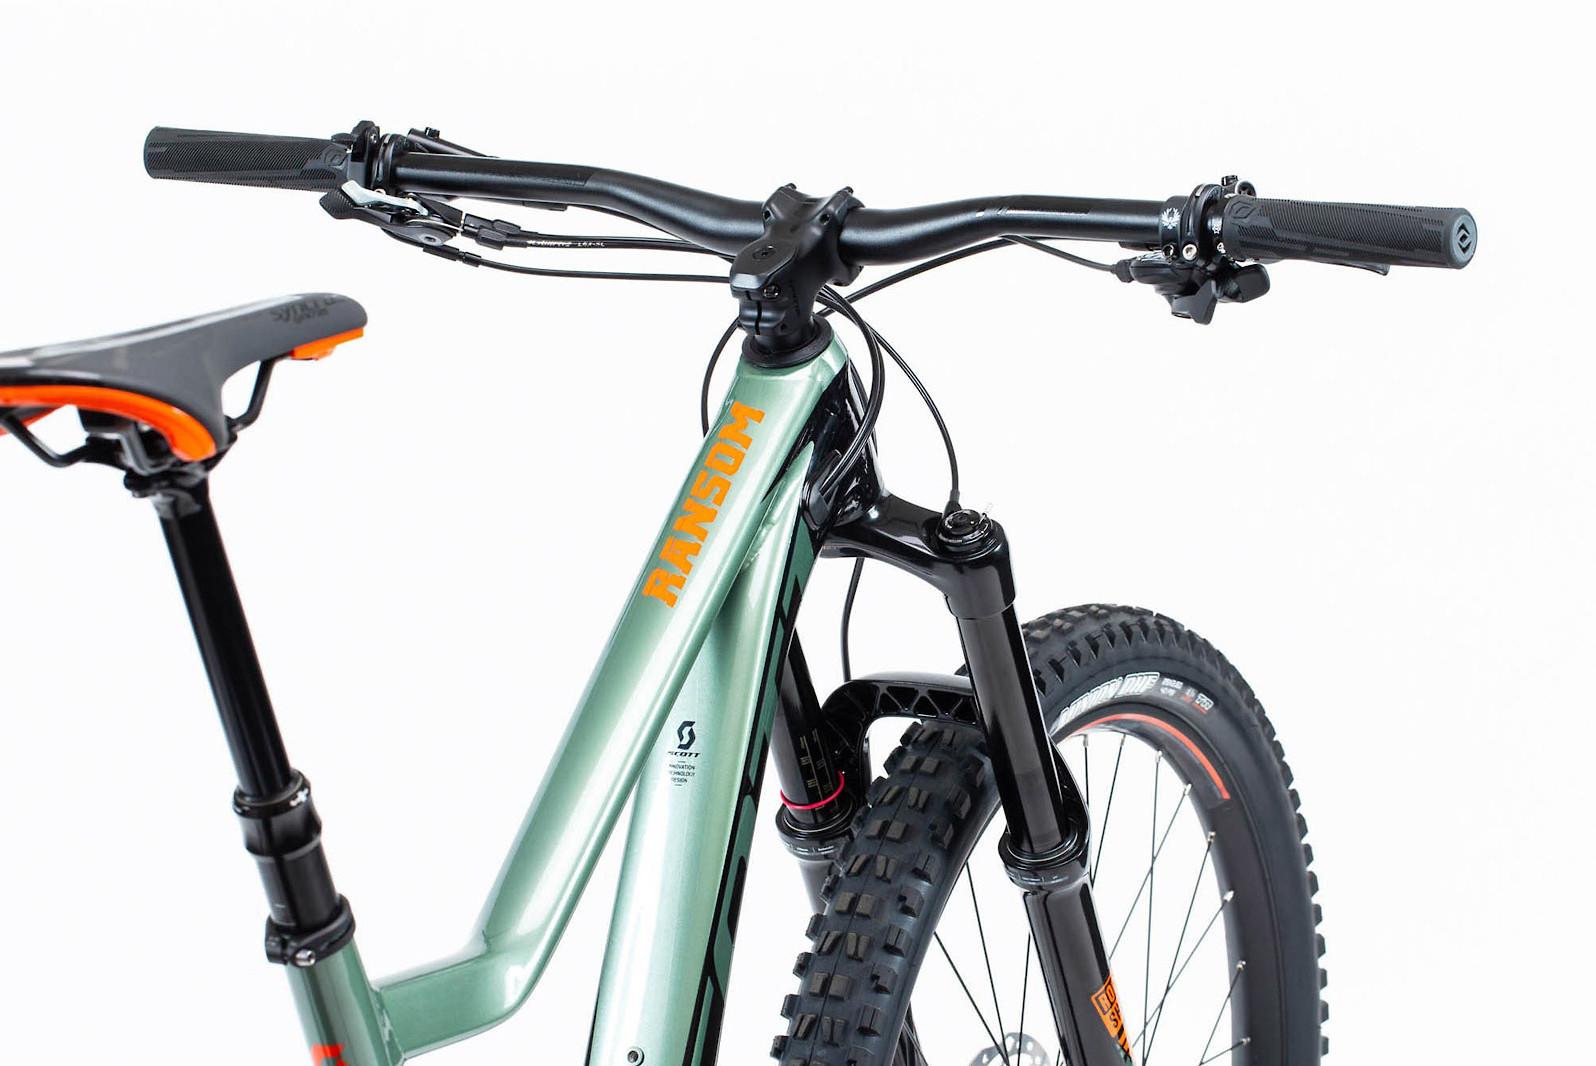 47561f1da36 2019 Scott Ransom 930 Bike - Reviews, Comparisons, Specs - Mountain ...